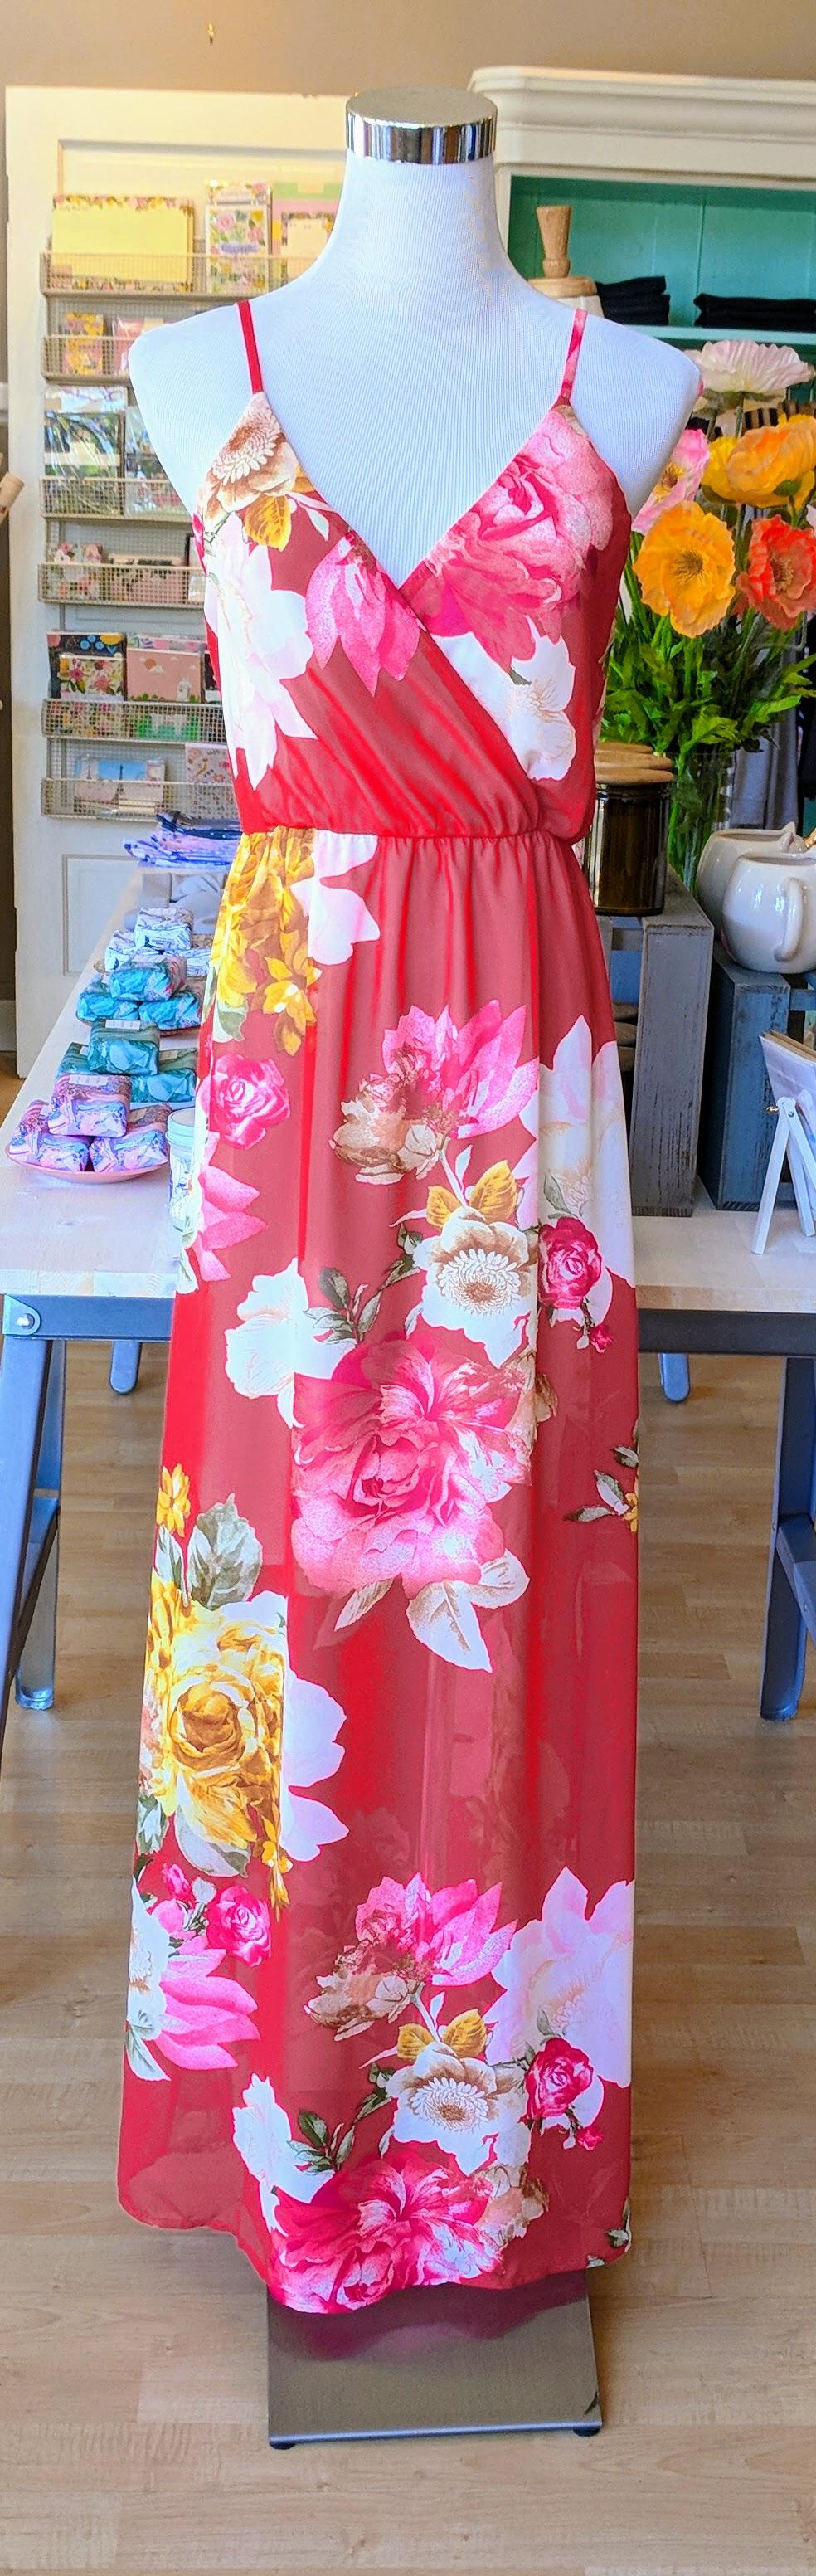 Red floral pattern faux wrap dress.